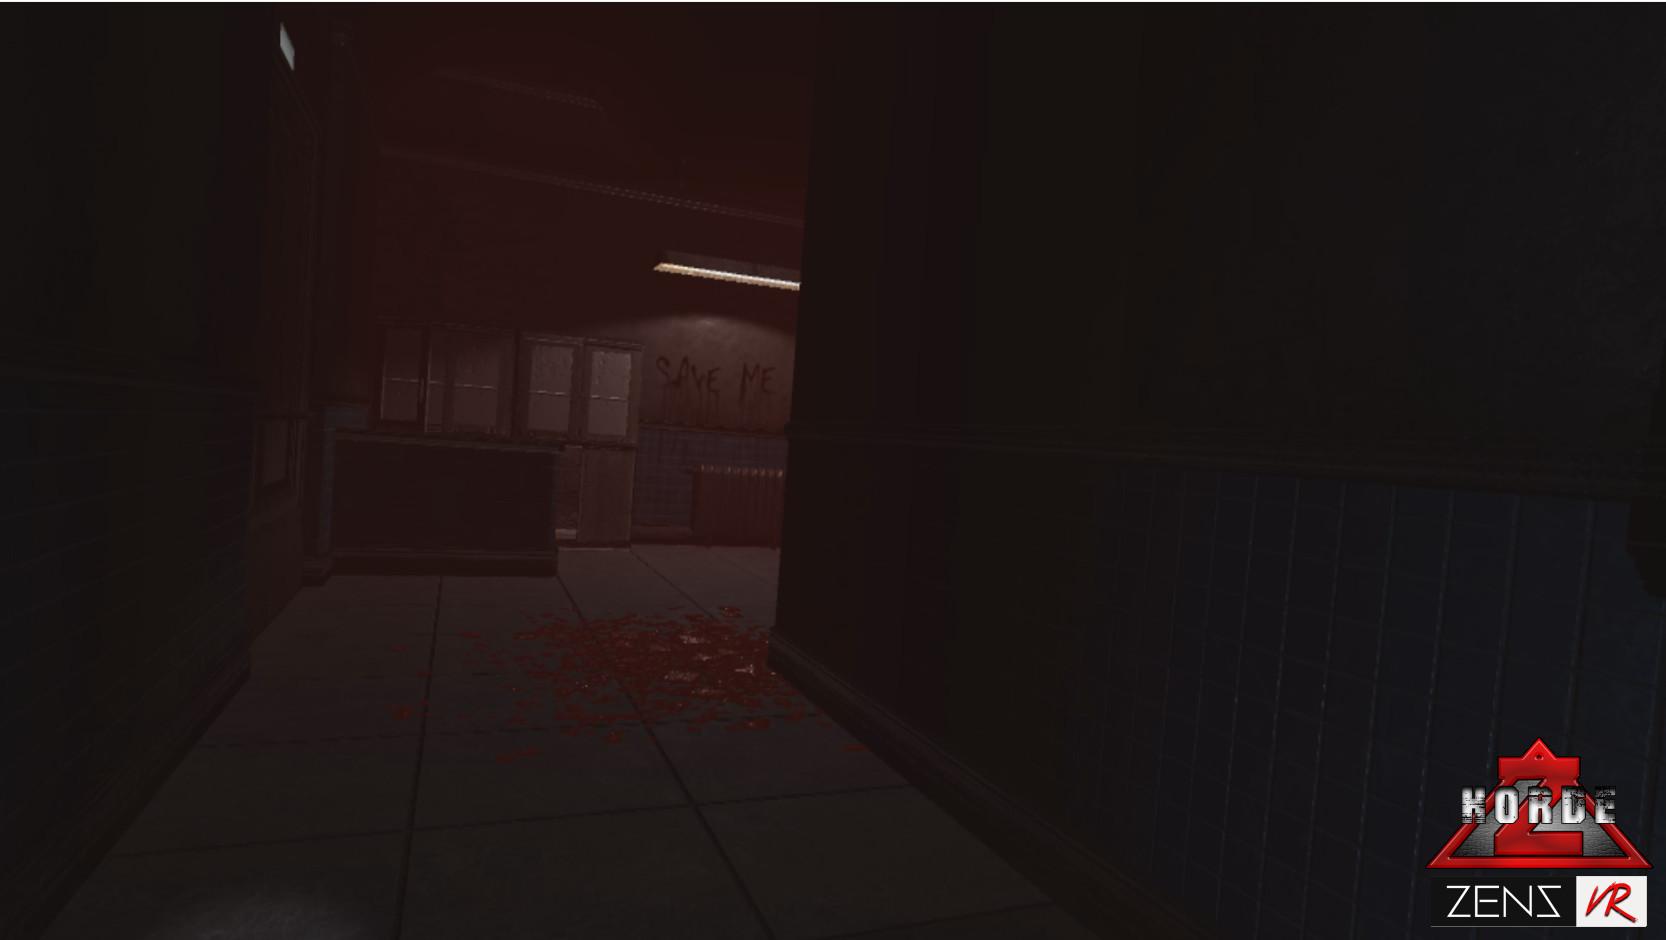 HordeZ screenshot